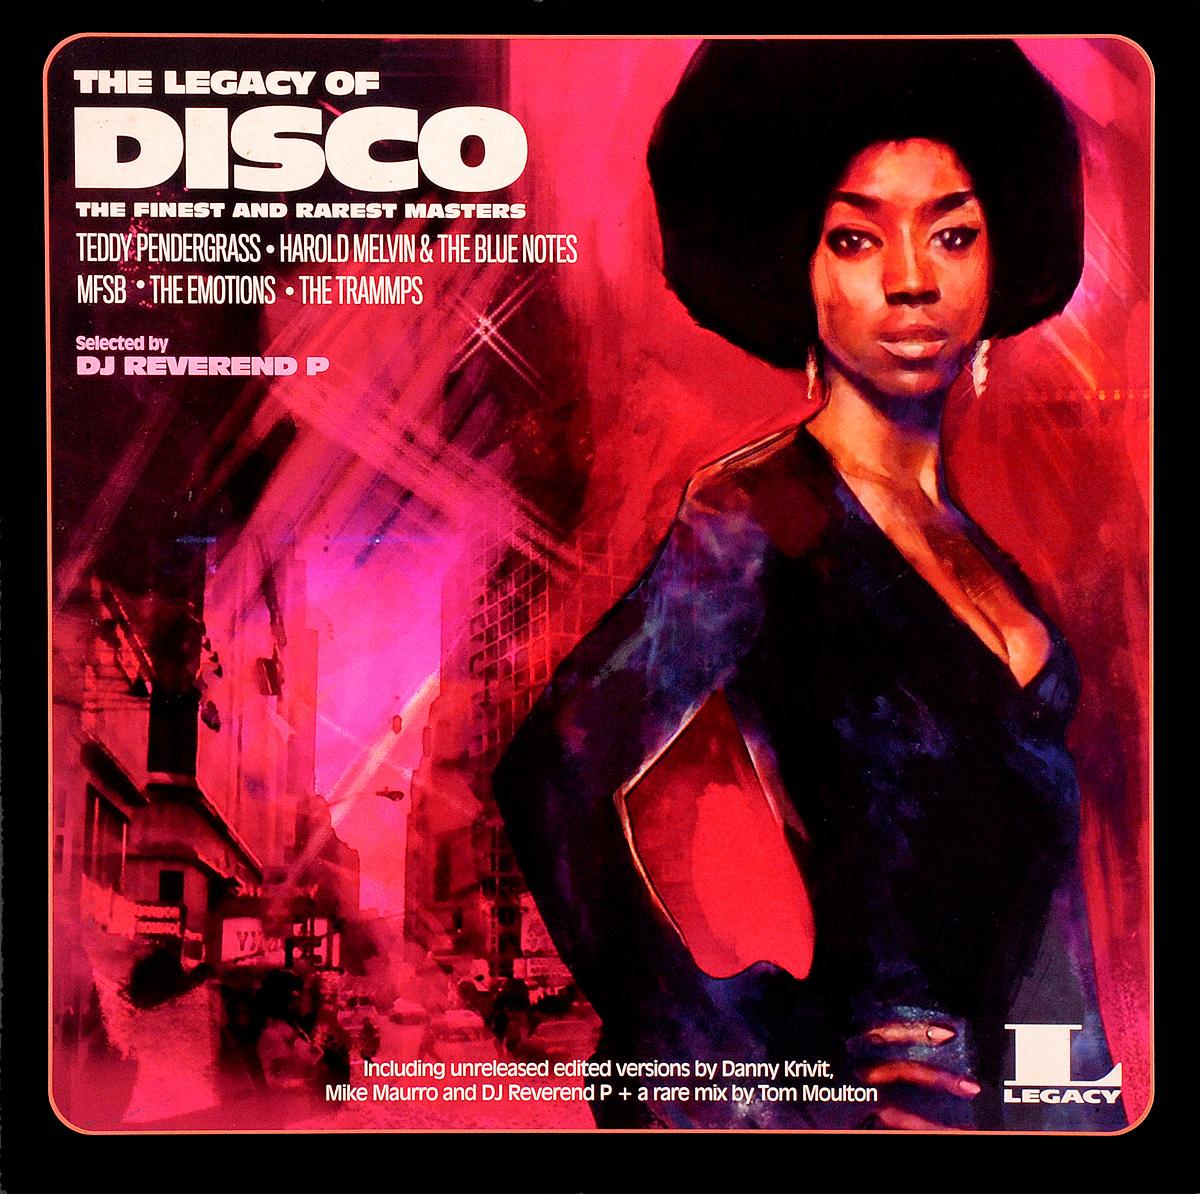 M.F.S.B.,The Emotions,DJ Reverend P,Тэдди Пендерграсс,Danny Krivit,Mike Maurro,Гарольд Мелвин,The Blue Notes,The Trammps The Legacy Of Disco (2 LP) the jacksons херби хэнкок dj reverend p марвин гэй michael wycoff gladys knight & the pips джордж дюк the isley brothers the legacy of funk 2 lp